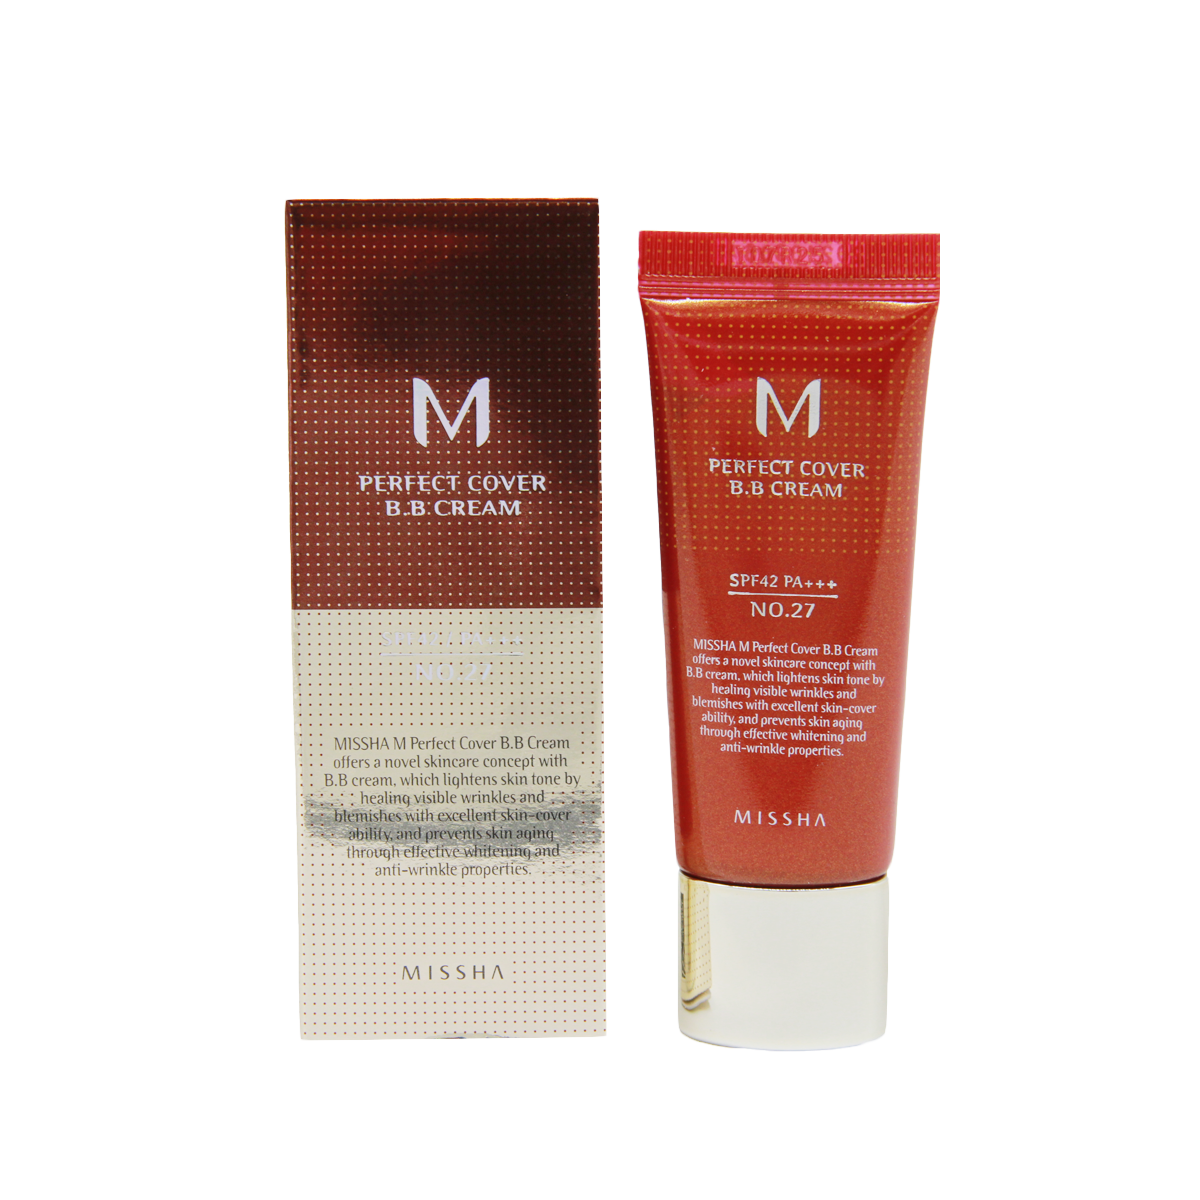 Декоративная косметика Тональный крем для лица M Perfect Cover BB Cream (No.21), 20 мл import_files_57_5780316461eb11e980fc3408042974b1_95fd1fa061ff11e980fc3408042974b1.png